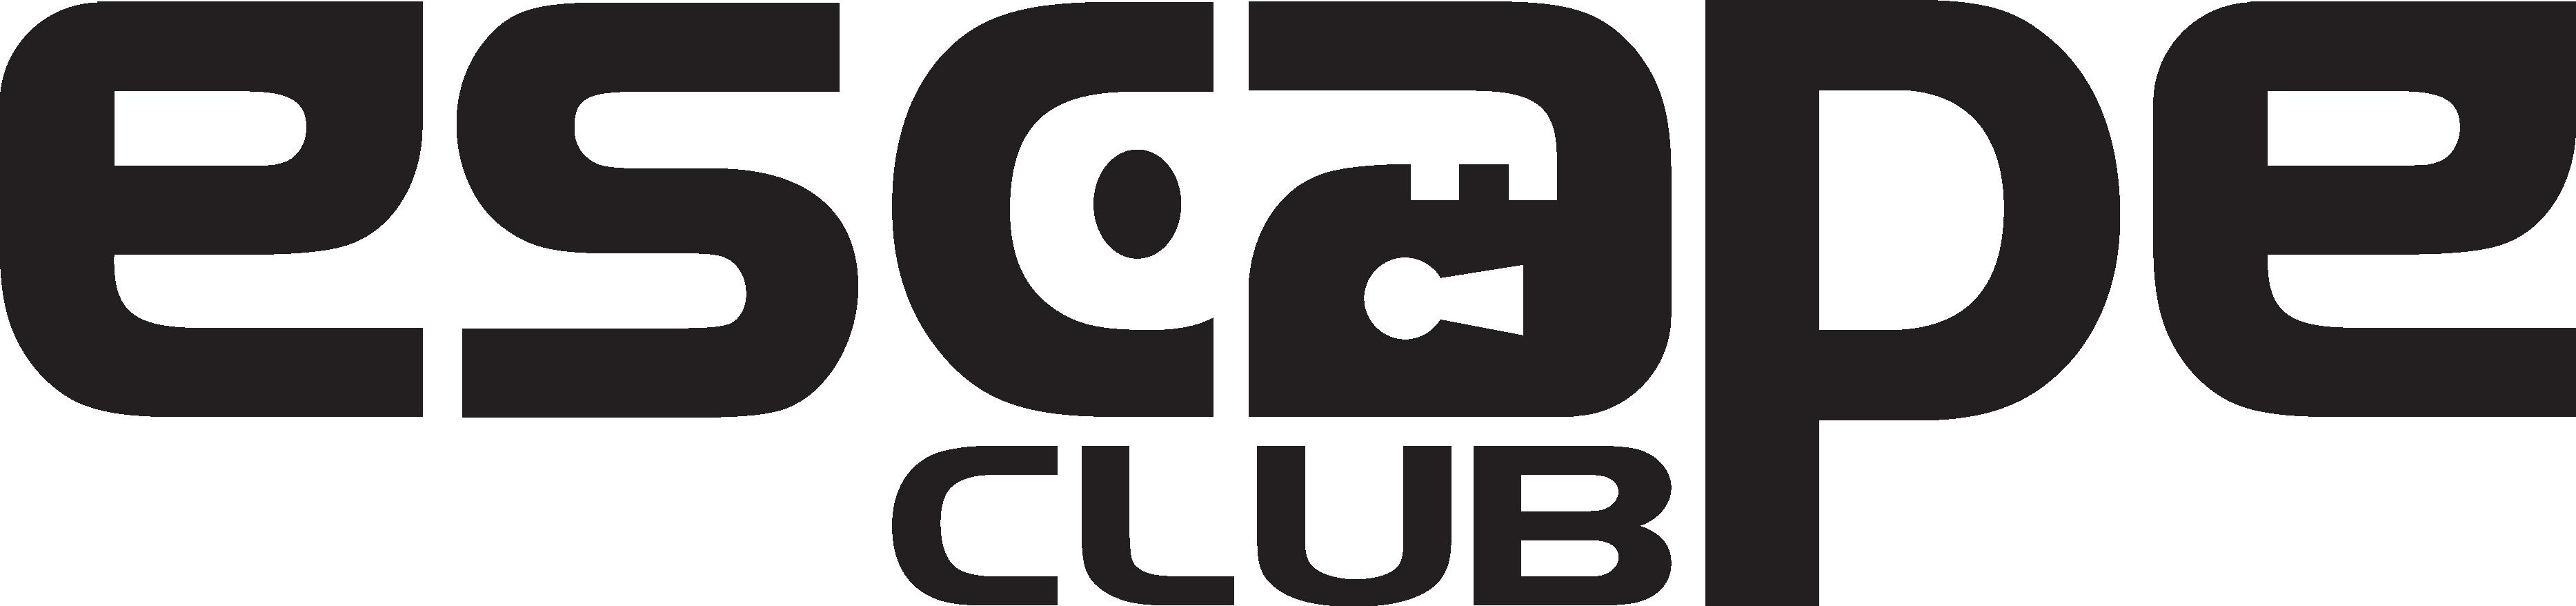 Escape Club Logo black and clear